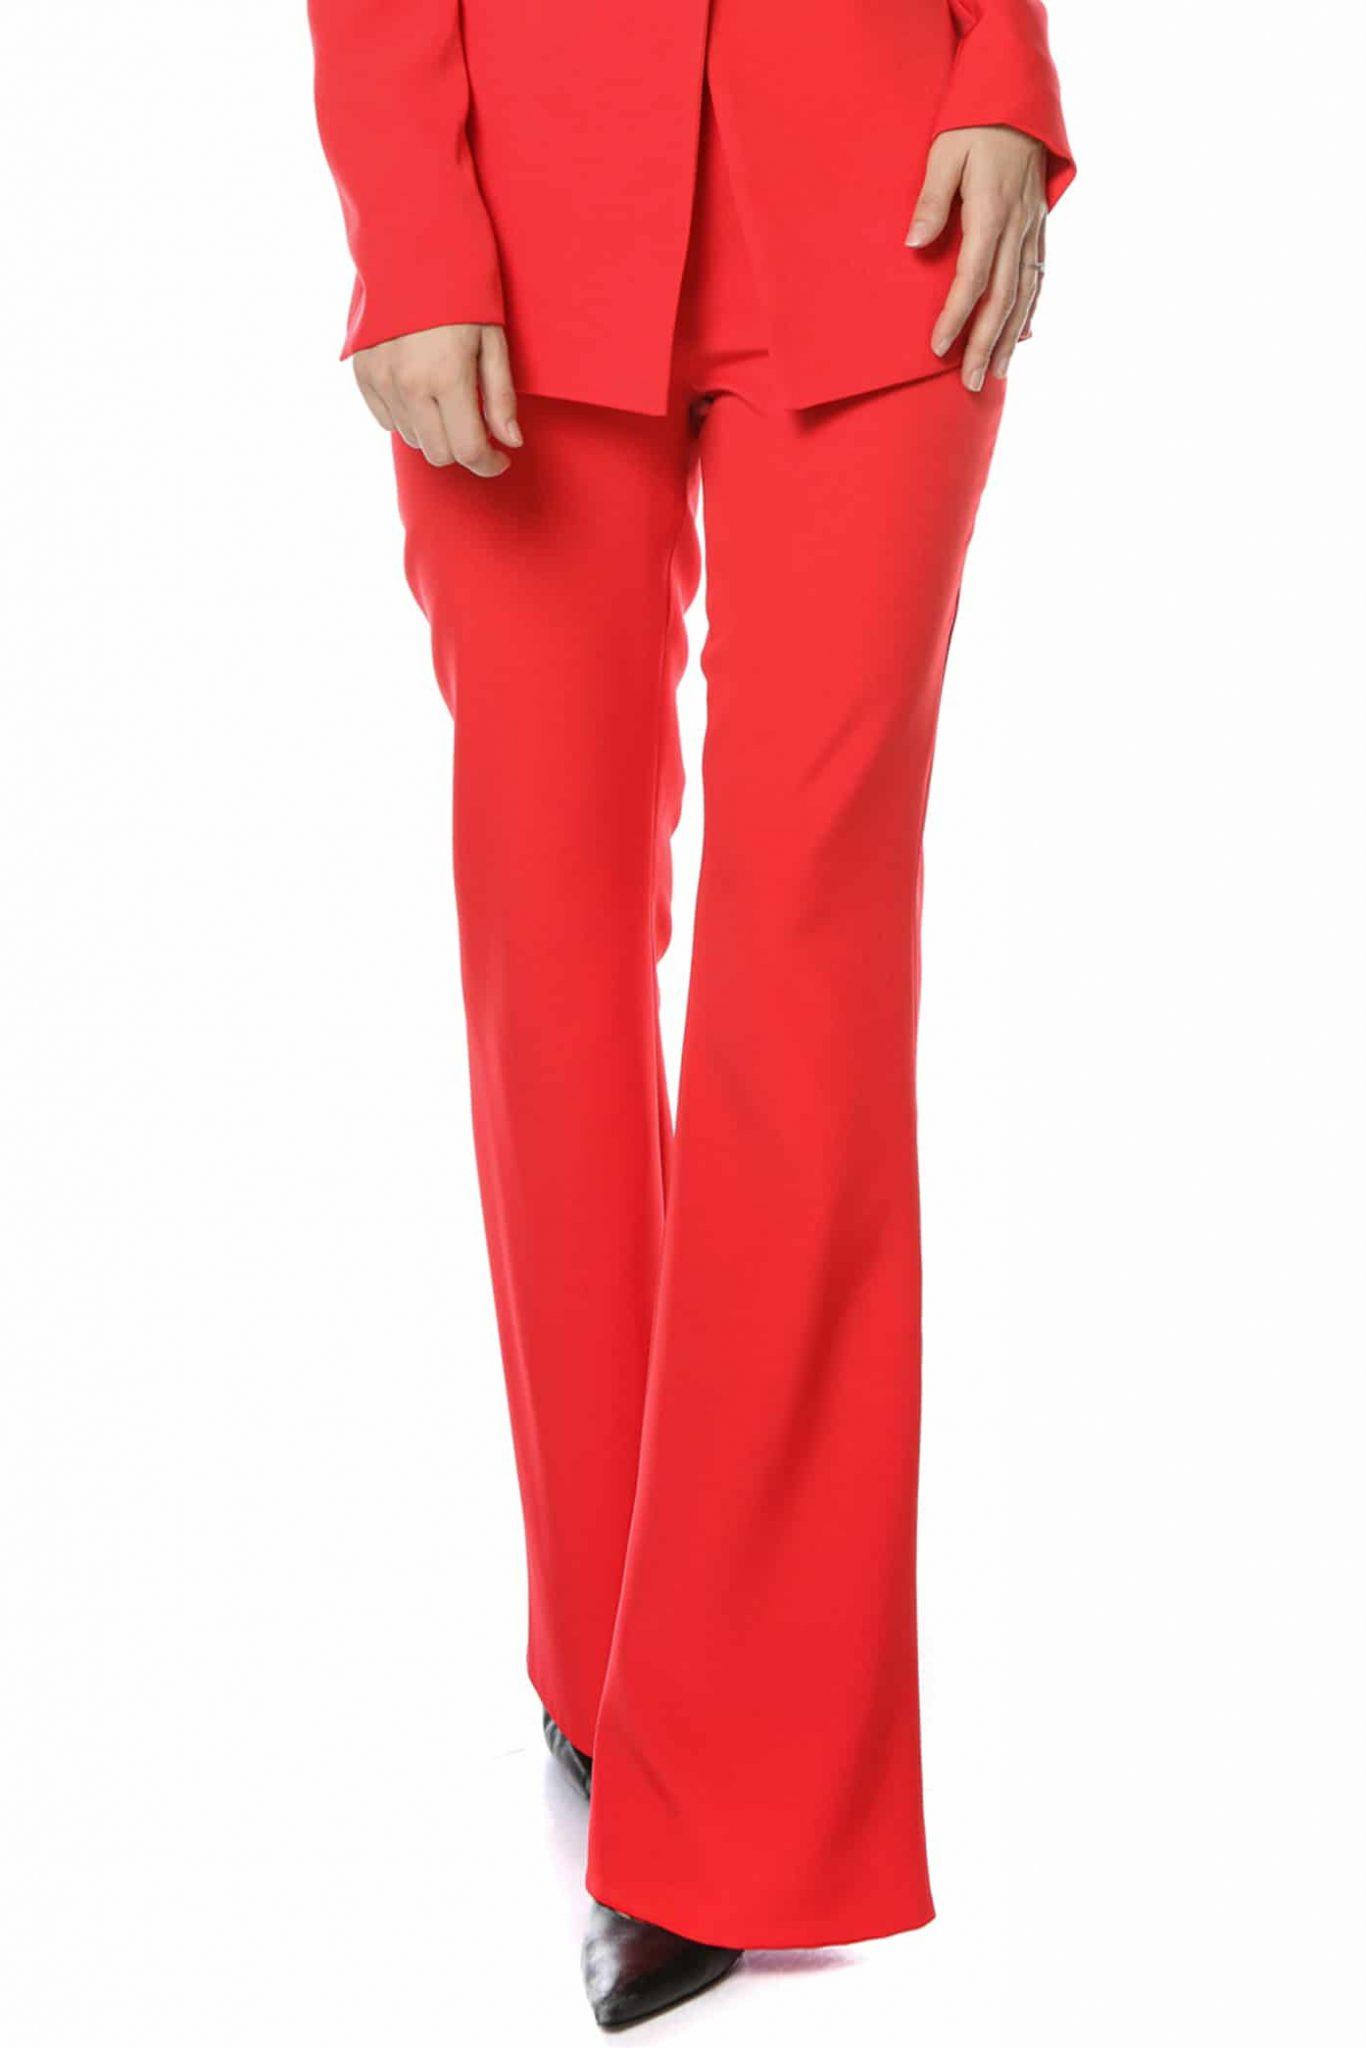 pantalon-evazat-anica-red